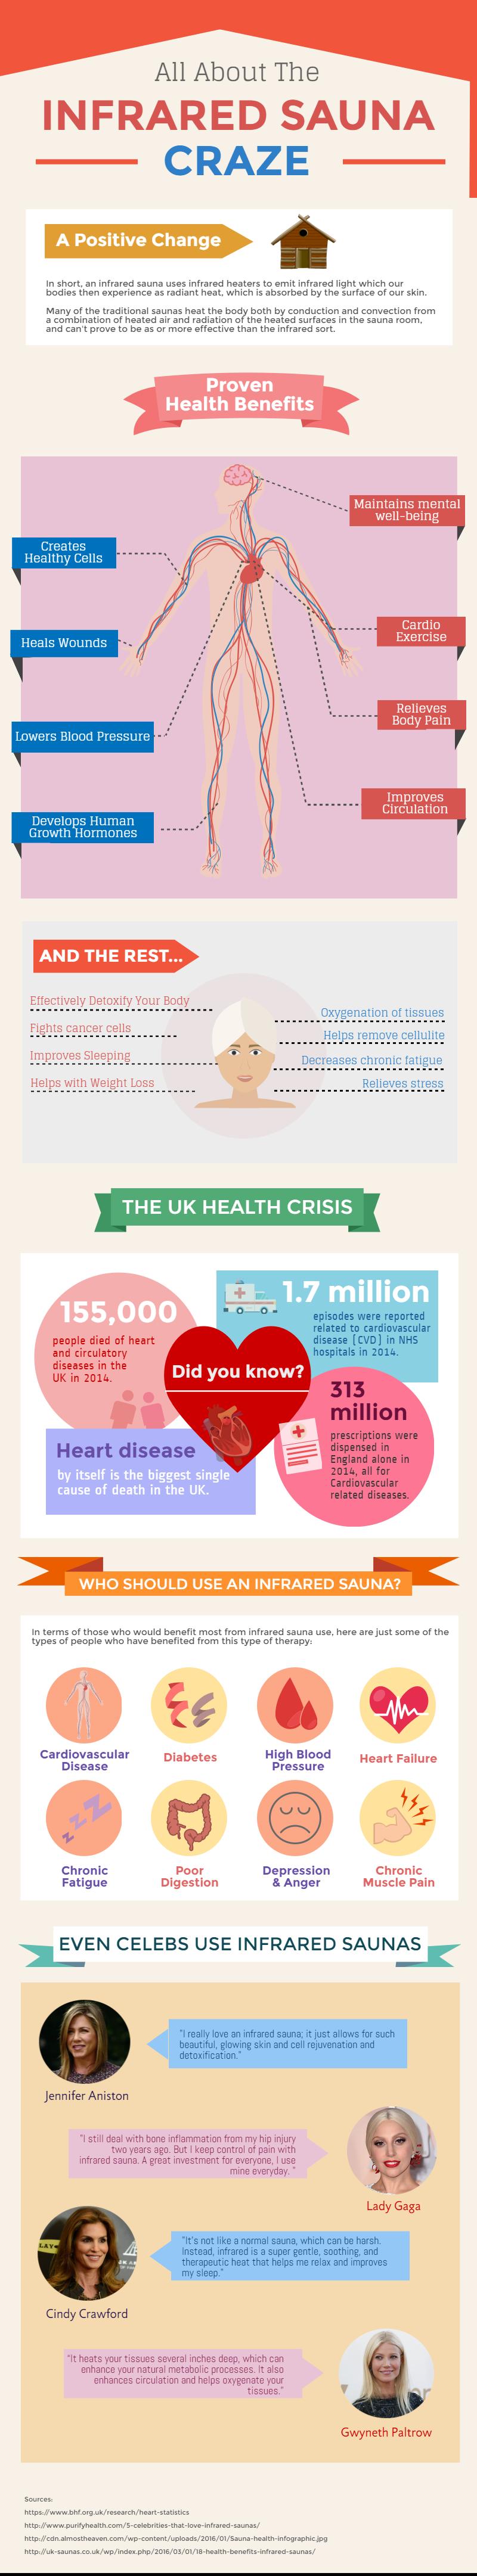 Infrared Sauna Health Benefits Infographic